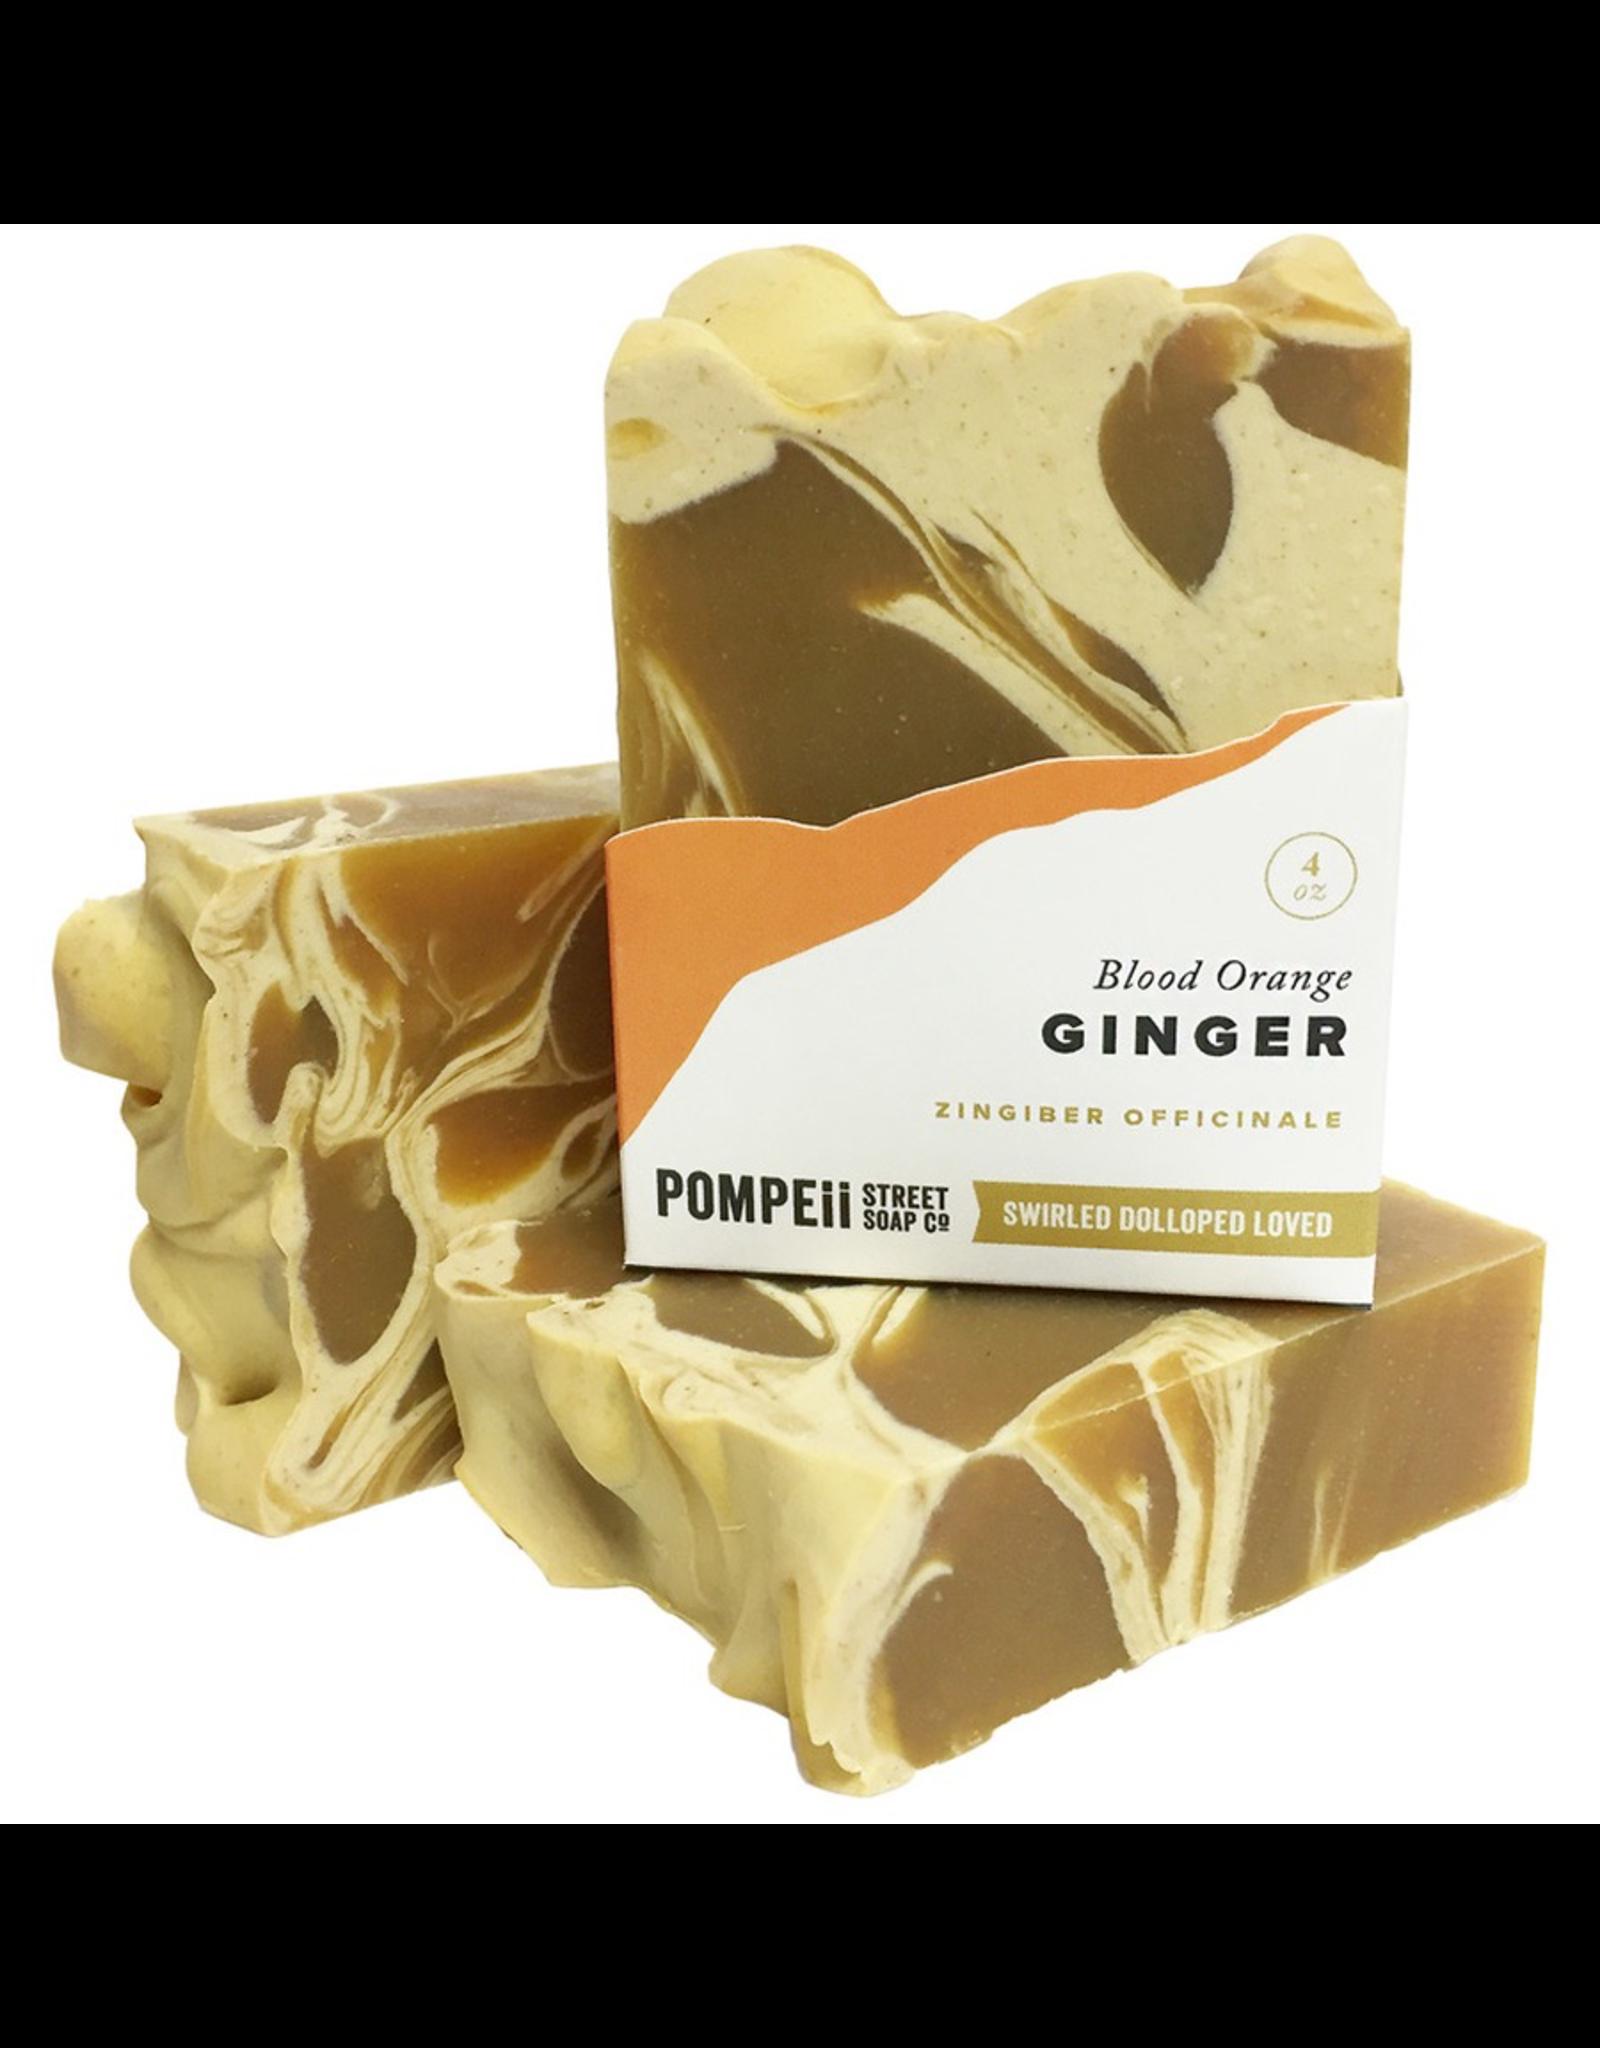 Pompeii Blood Orange and Ginger Soap 4 oz.